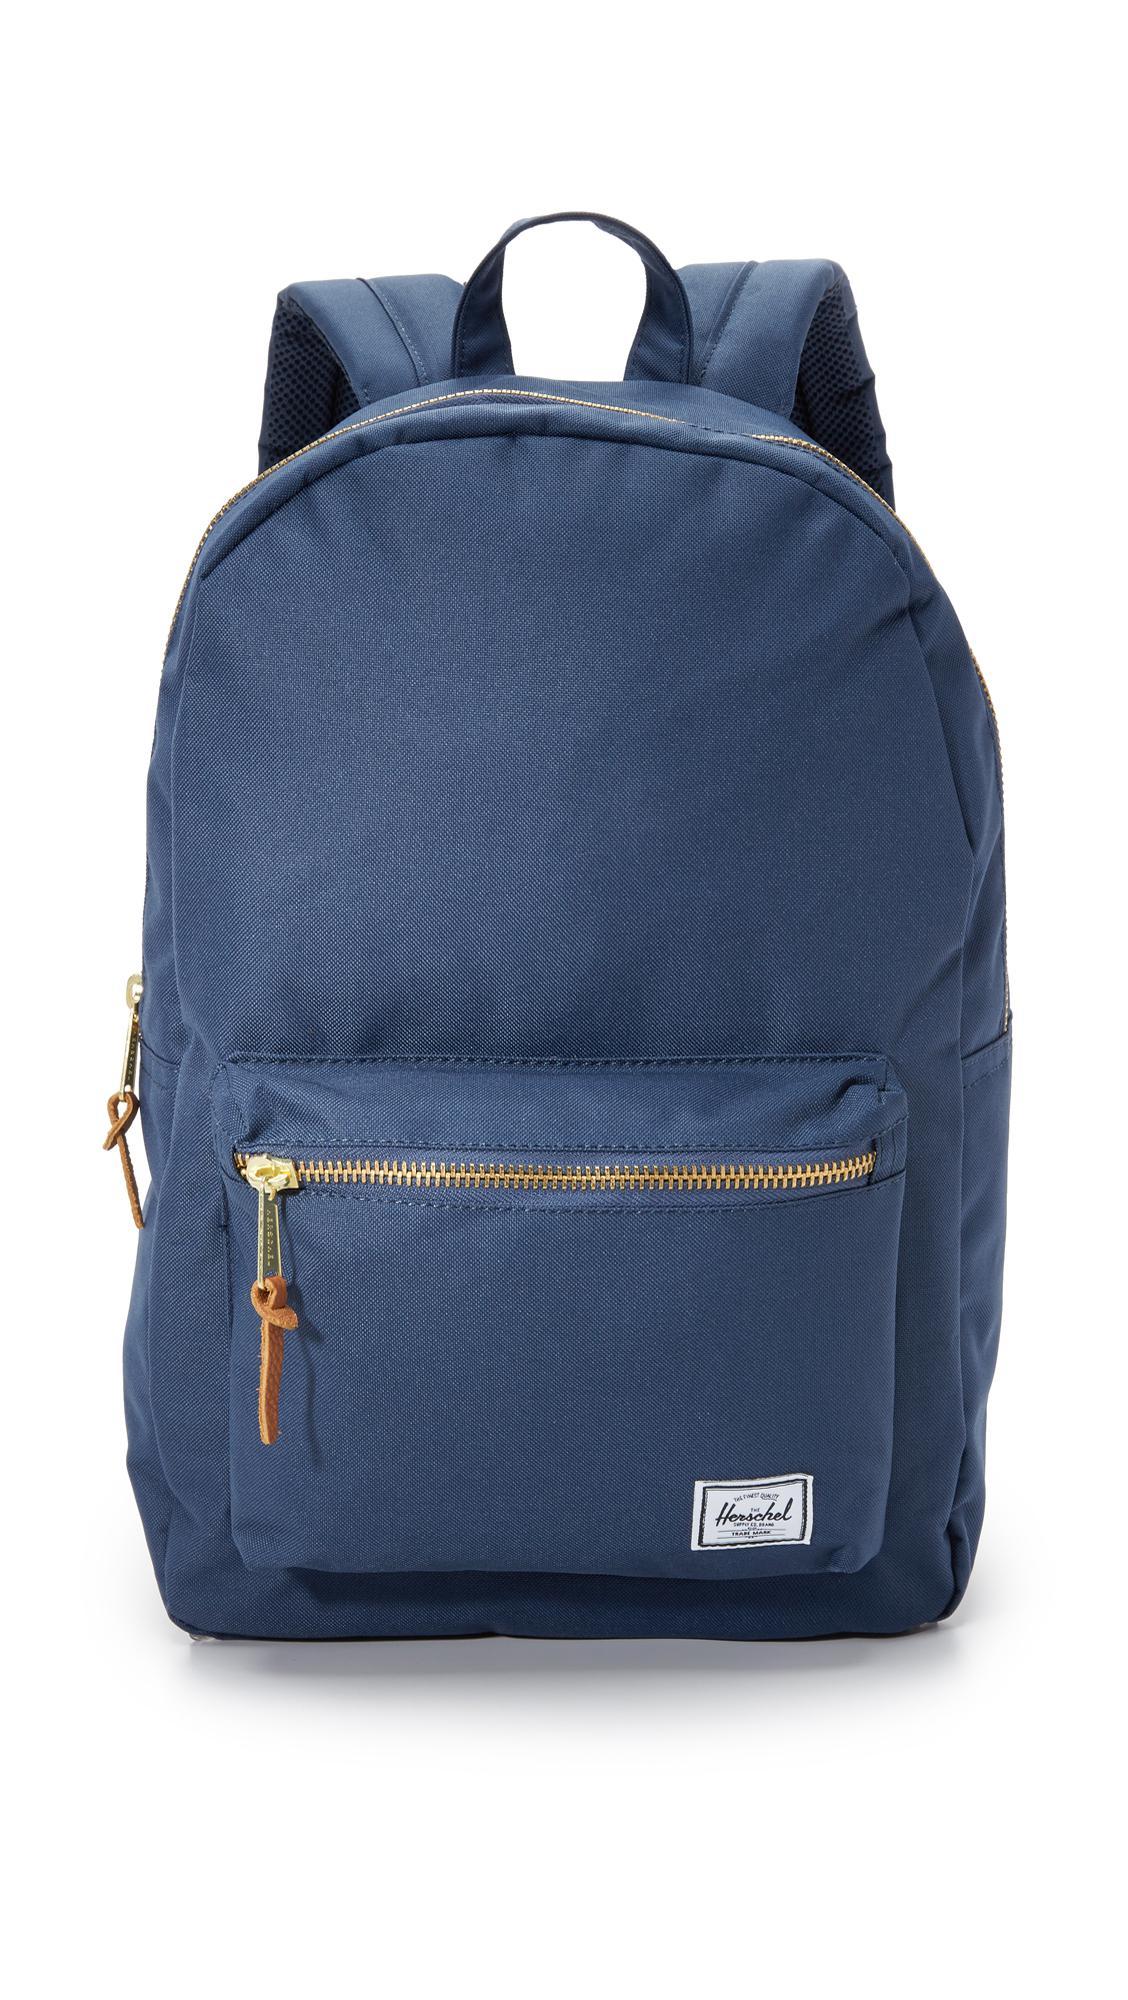 c3f6be2584 Herschel Supply Co. Blue Settlement Backpack.  84 From East Dane